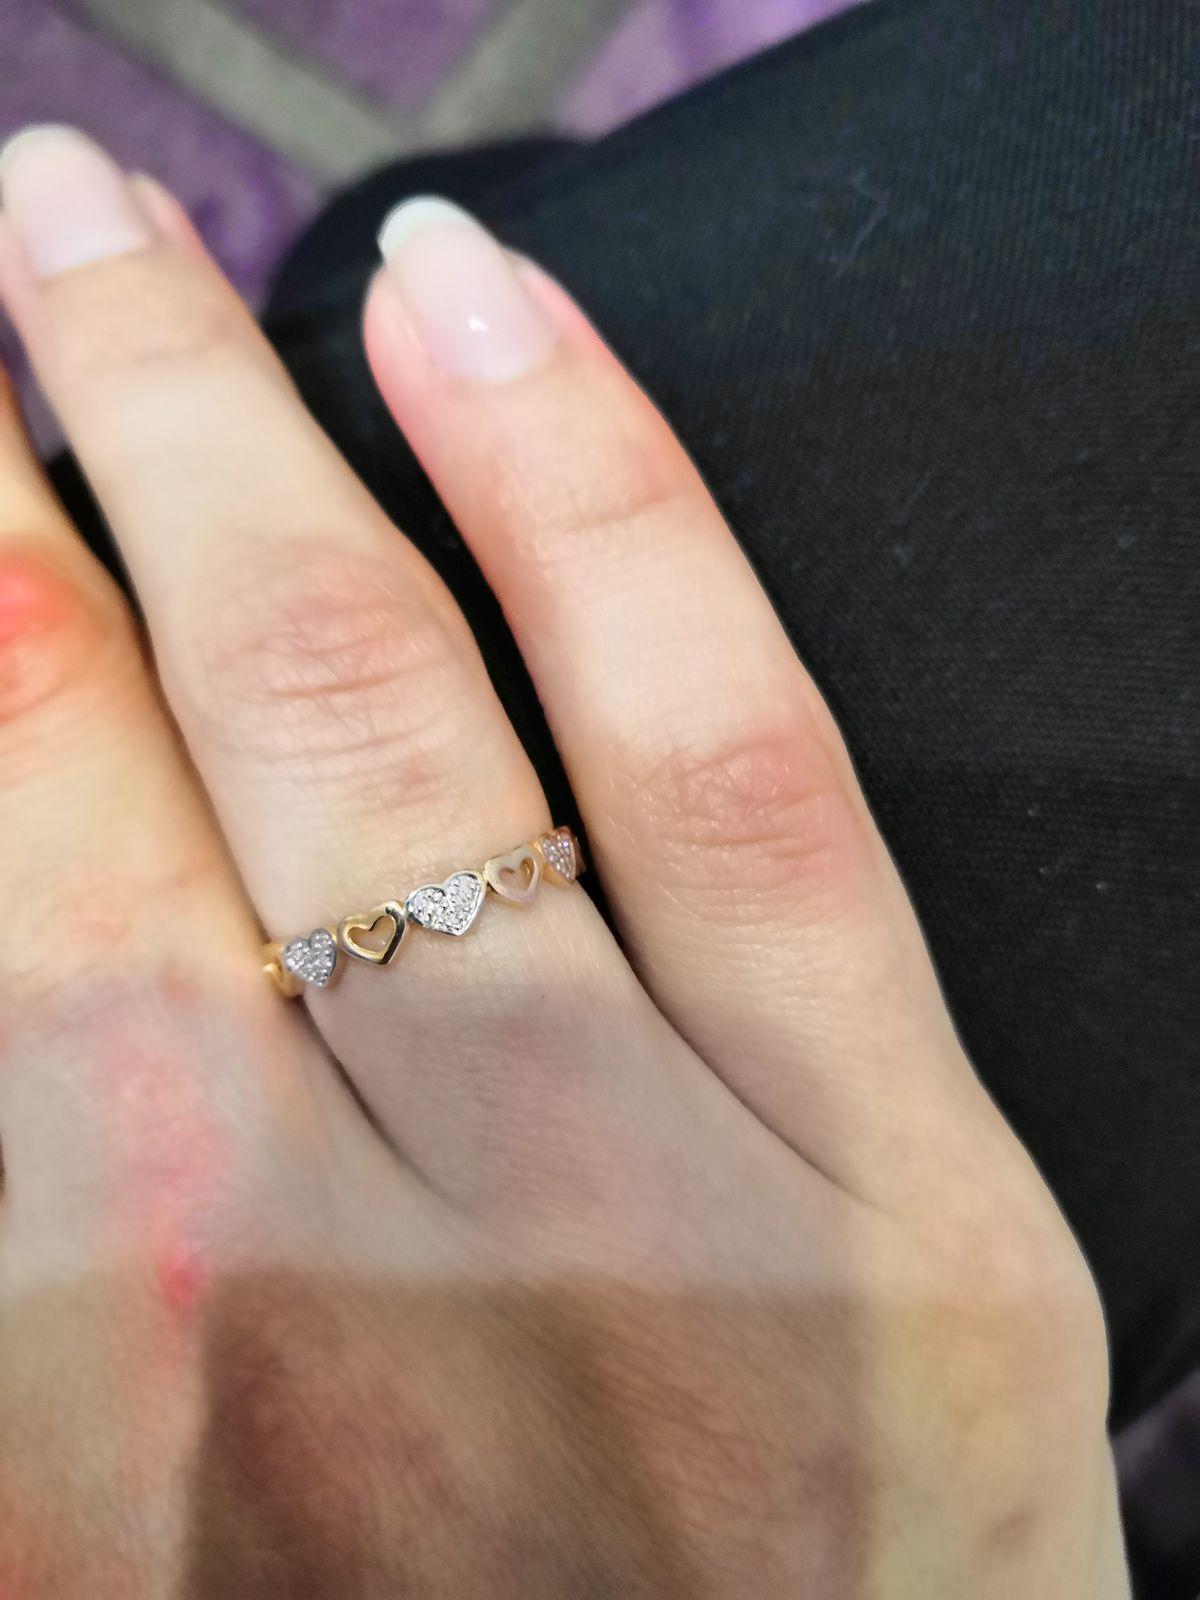 Нежное кольцо с бриллиантами!